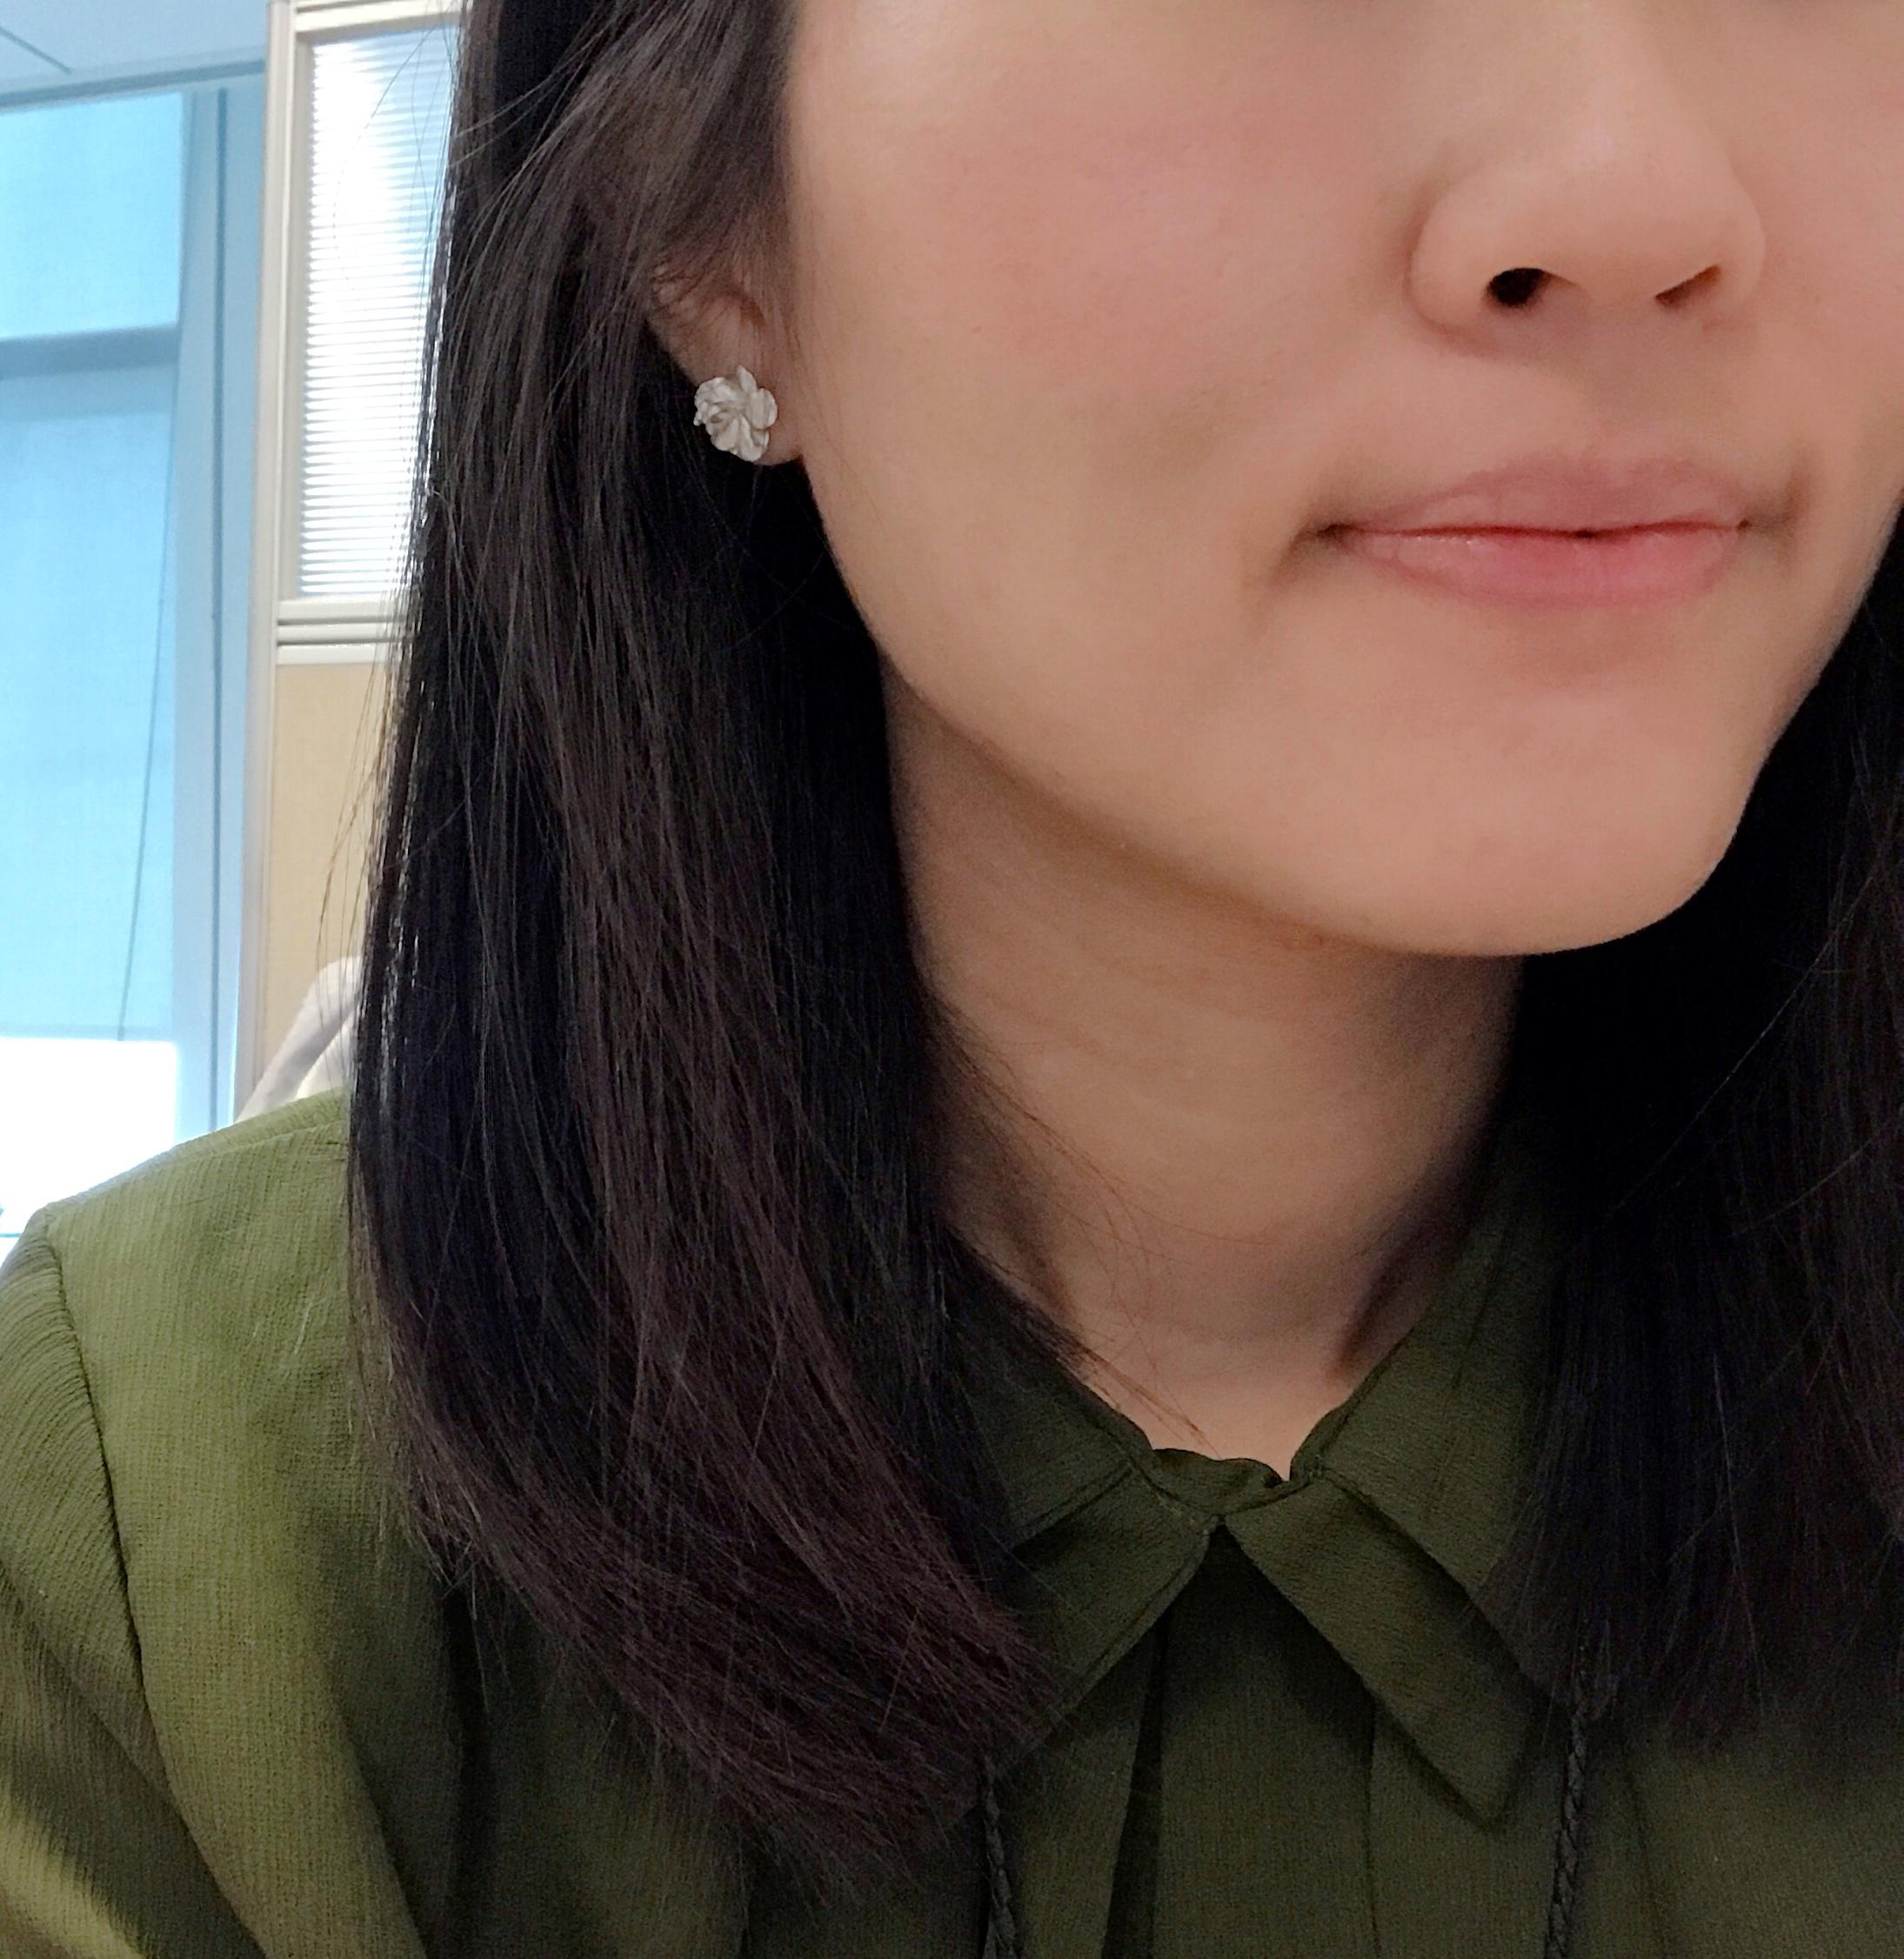 純銀耳環 - 小扶桑花款